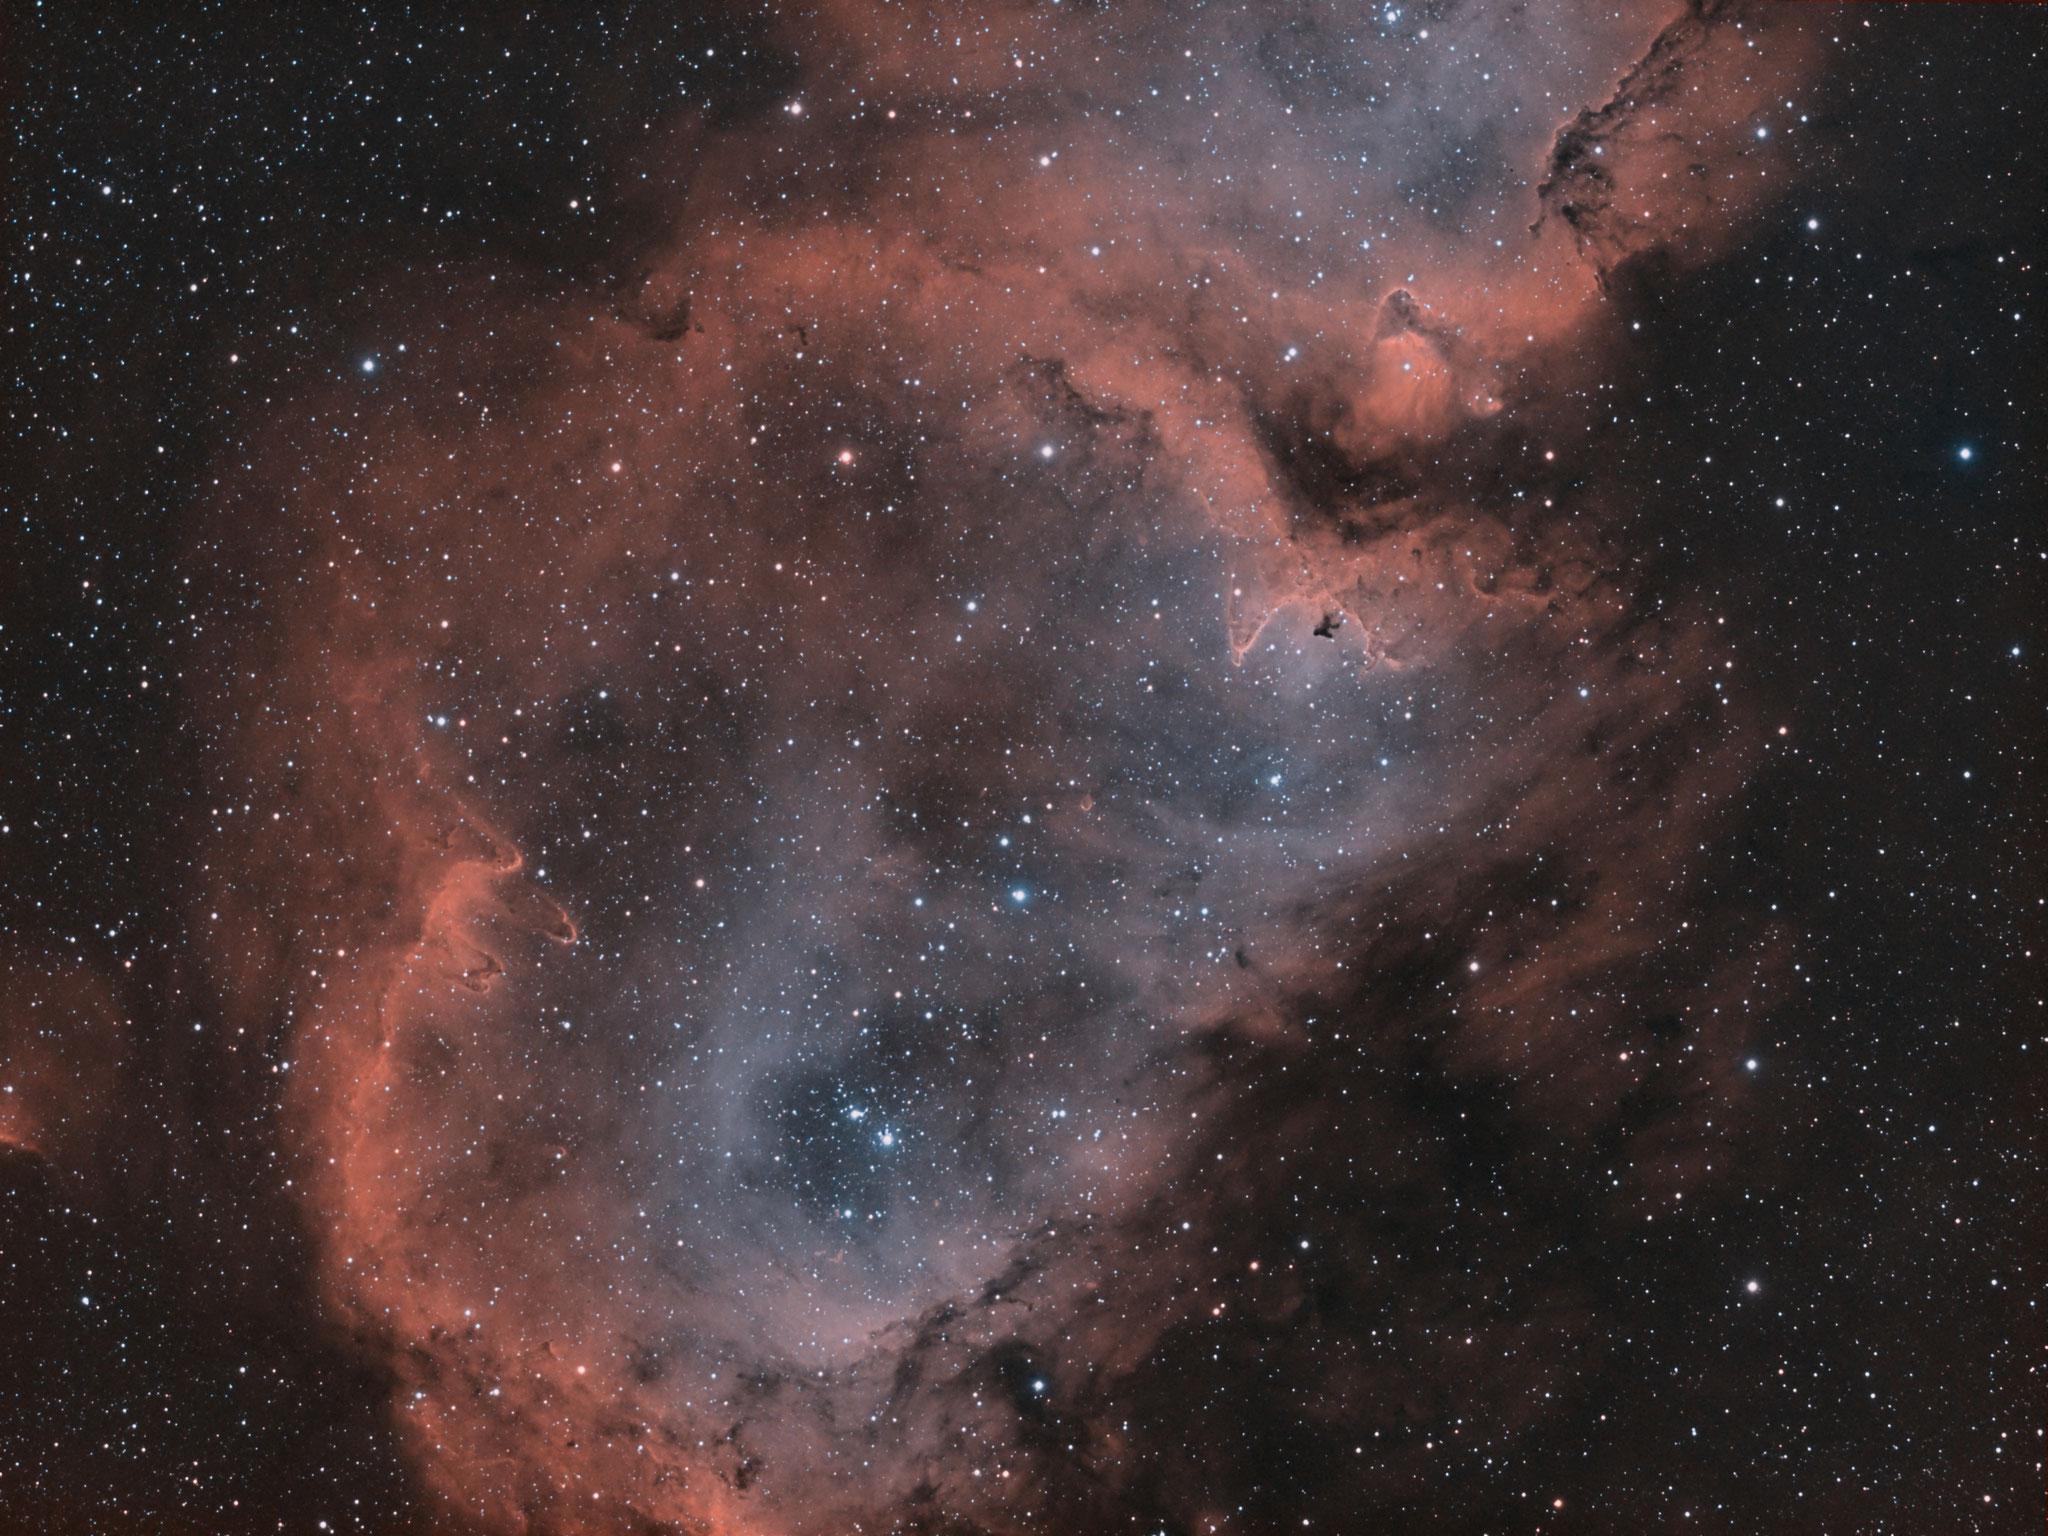 IC 1848; Seelennebel; APM LZOS 130/780, Riccardi-Reducer f=585mm; Ha 101x180s, OIII 103x180s; Astronomik Ha / OIII Filter 12nm